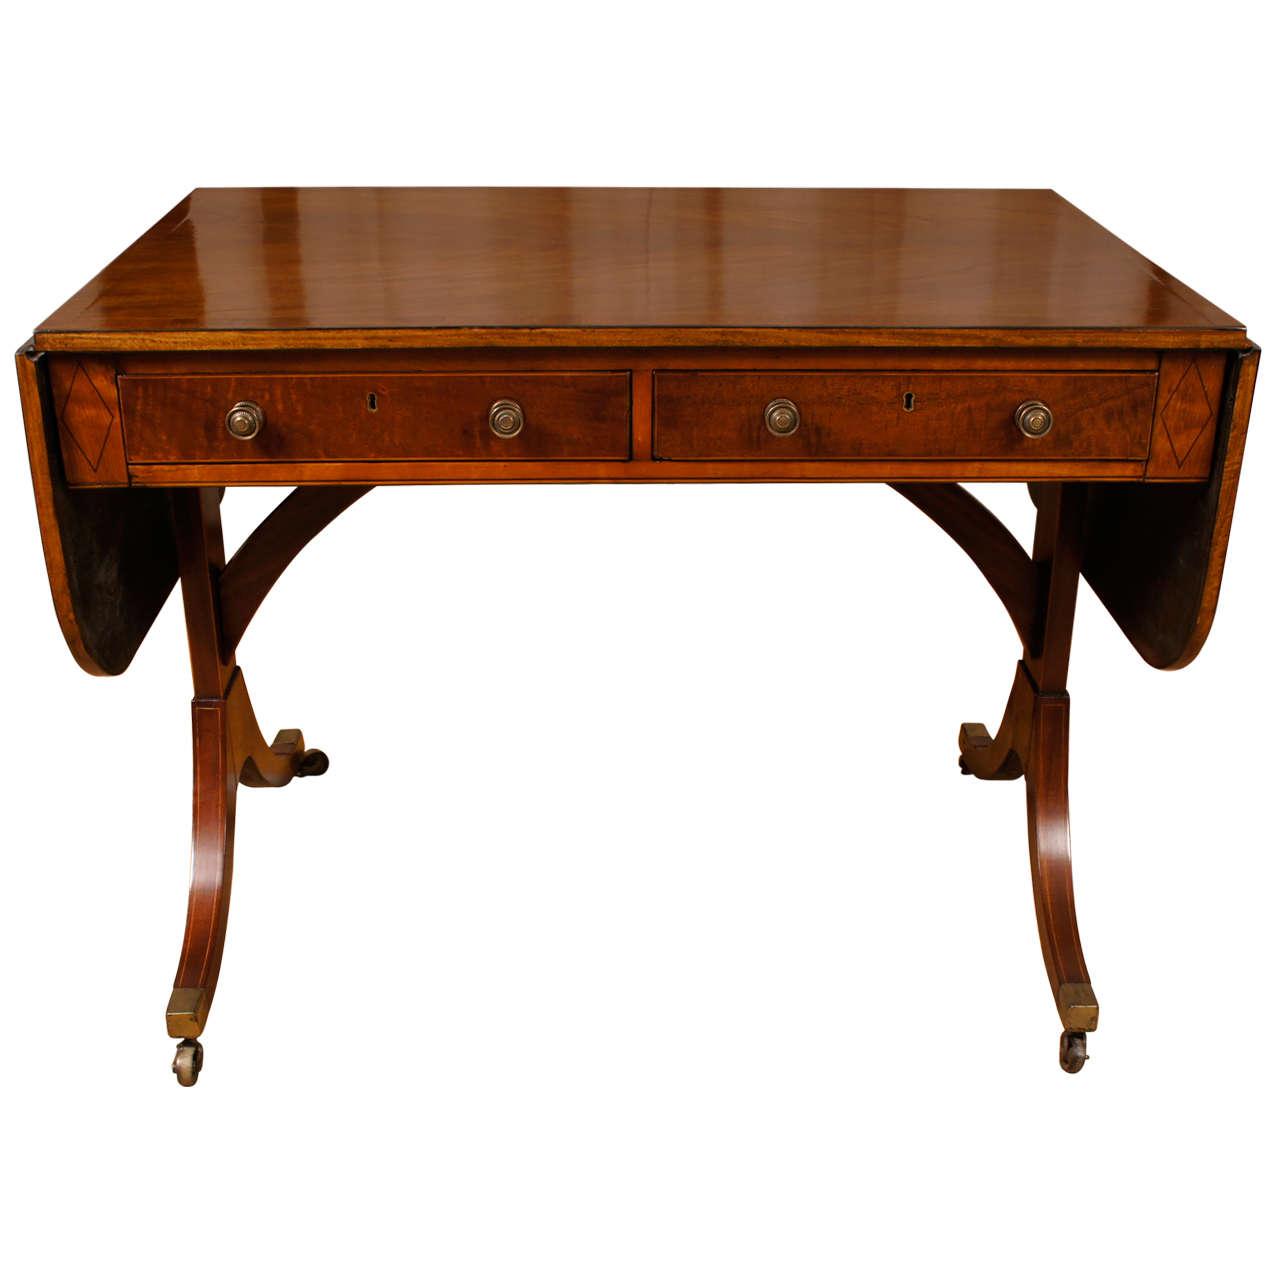 English George Iii Style Sofa Table At 1stdibs